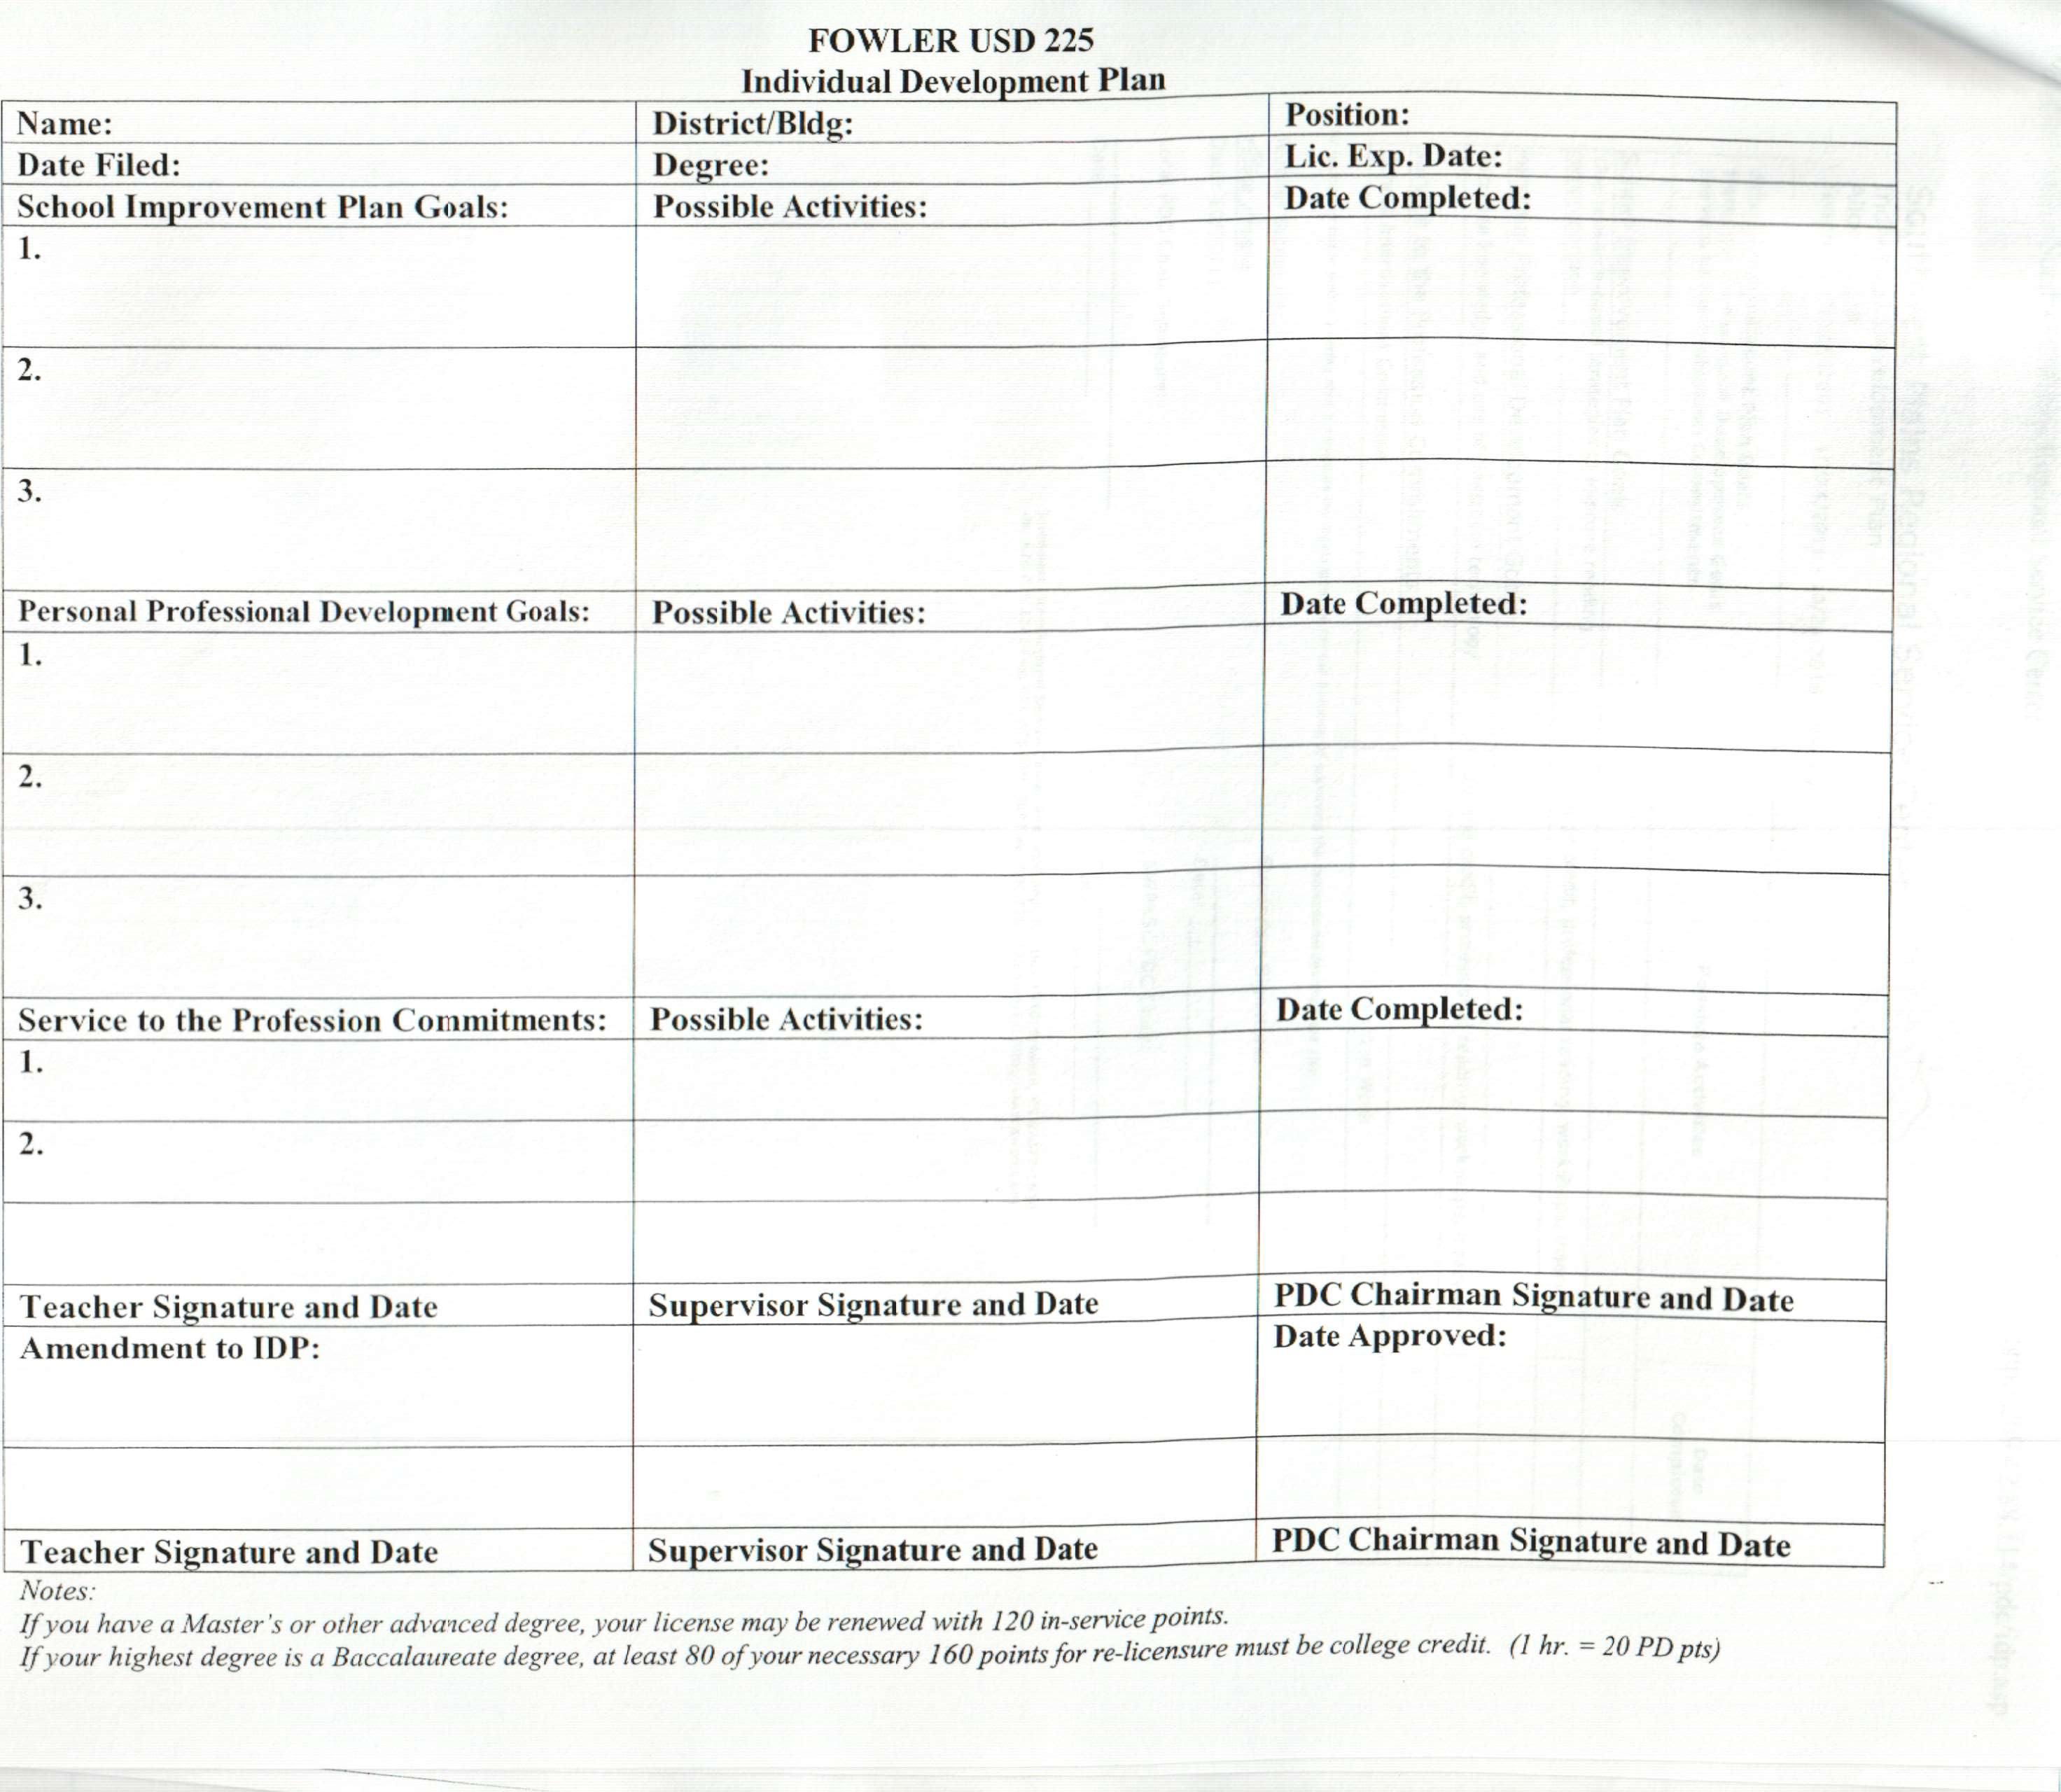 Fowler Schools USD 225 - Professional Development Committee